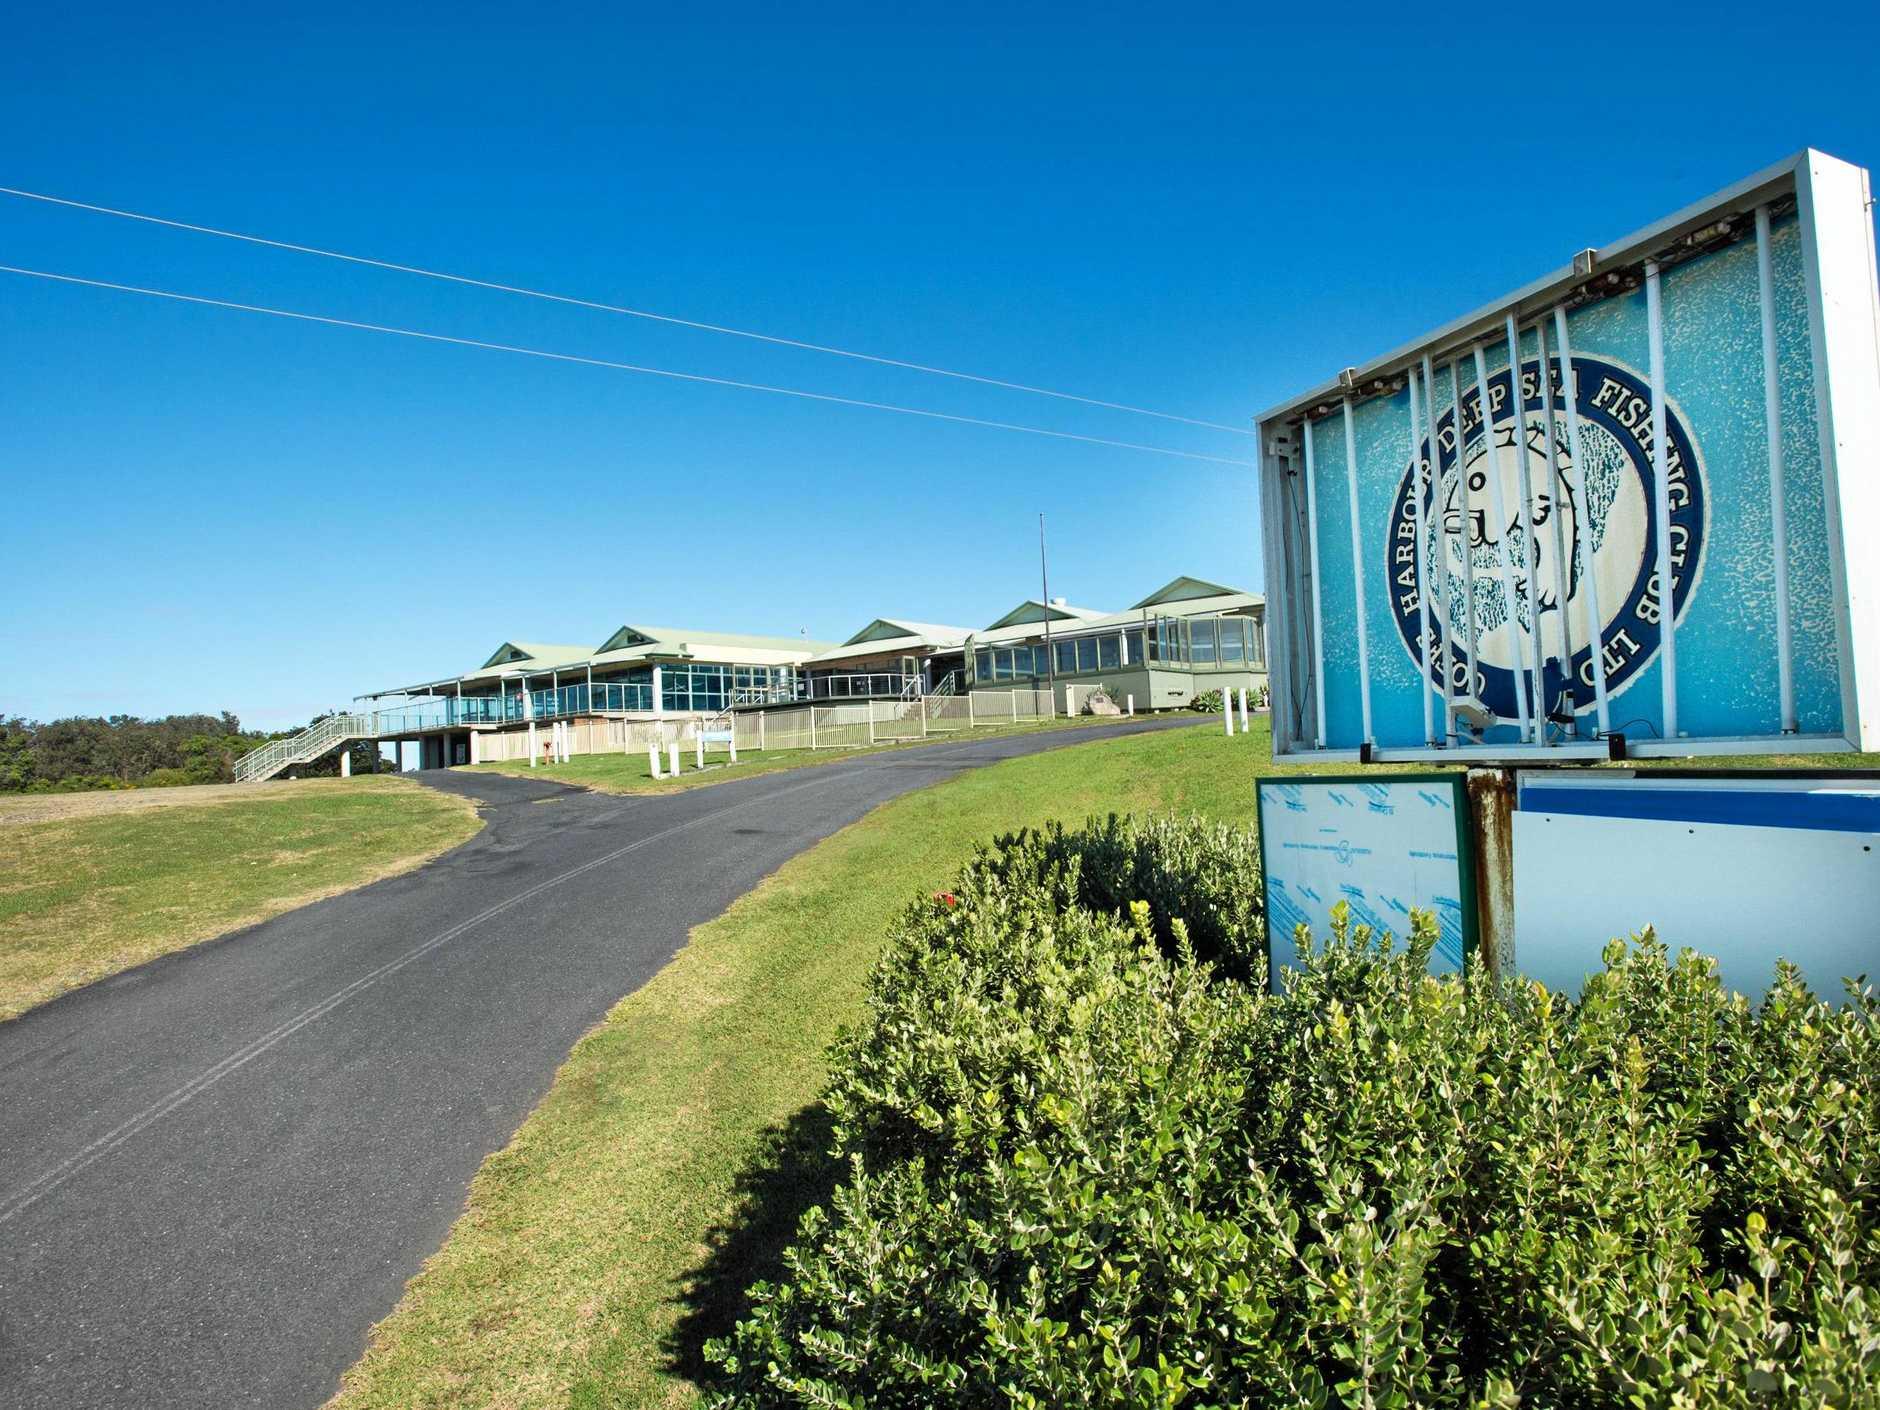 Coffs Harbour deep sea fishing club. 27 April 2017